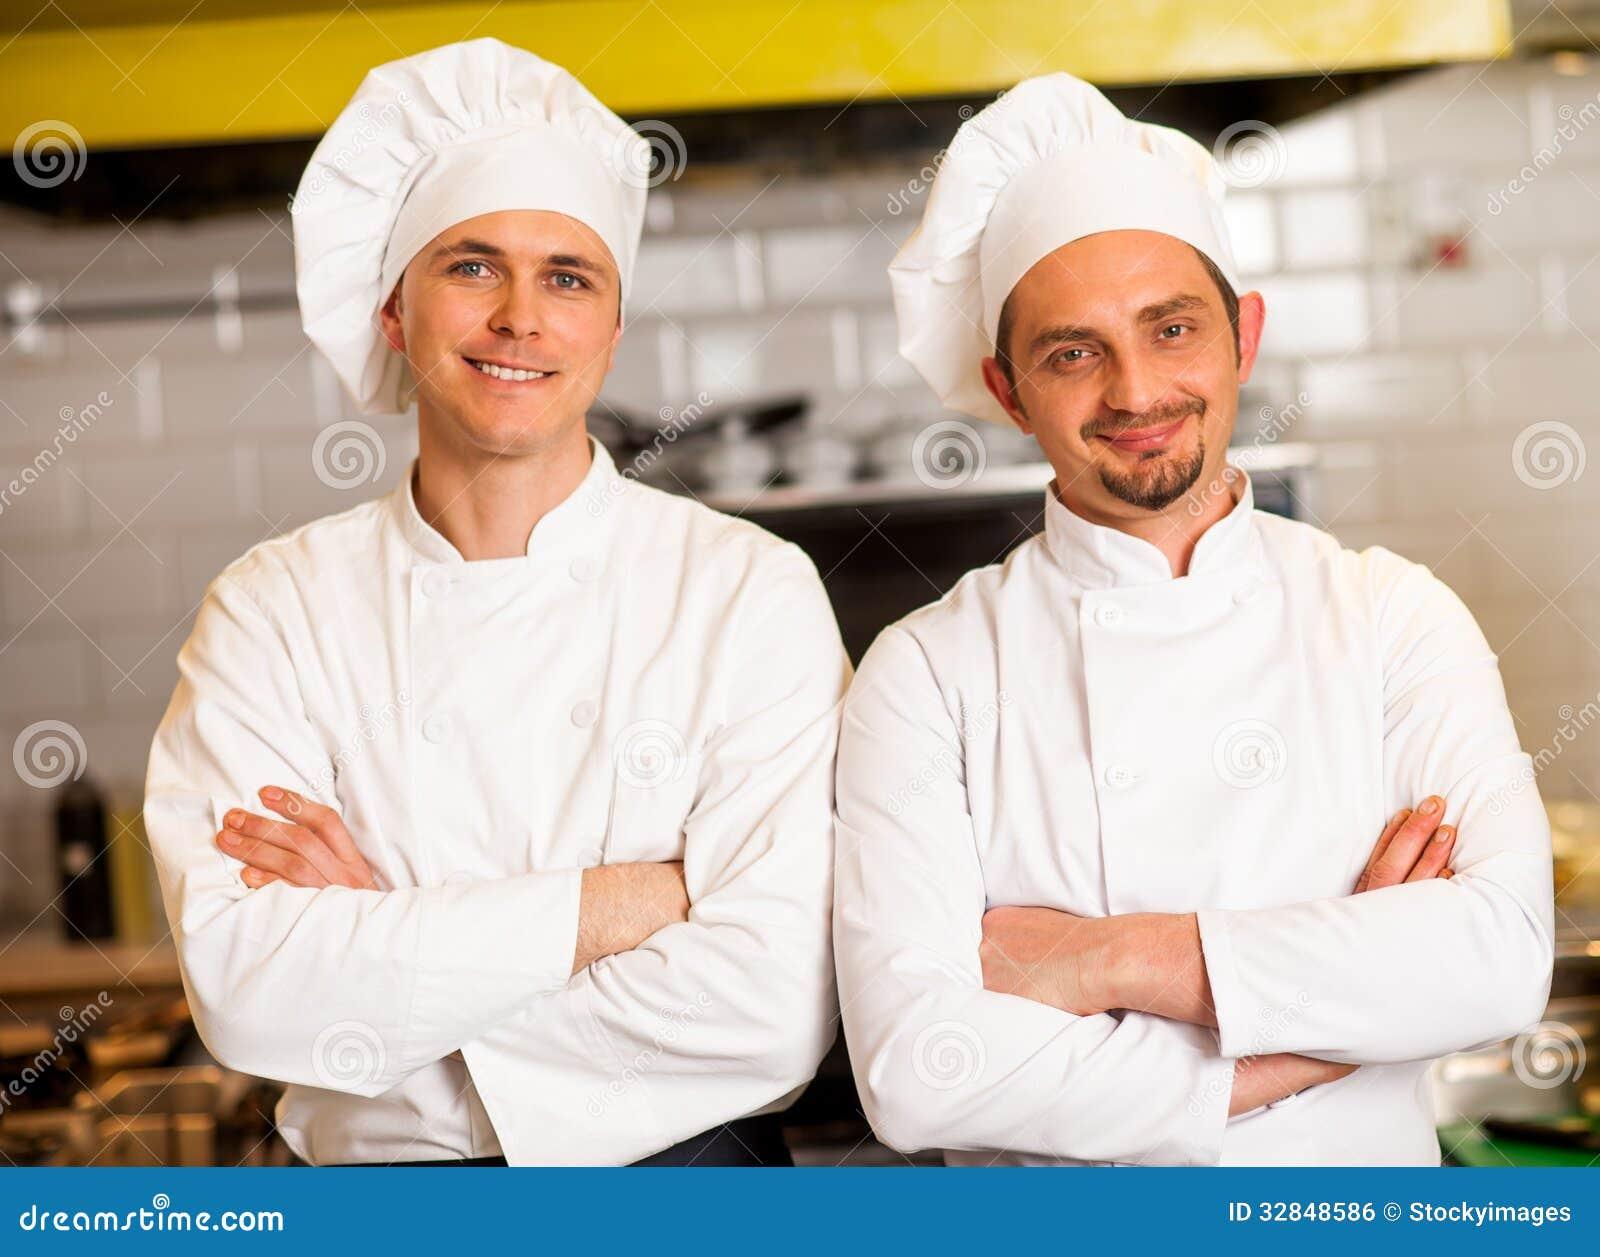 Male chefs pornhub foto 20